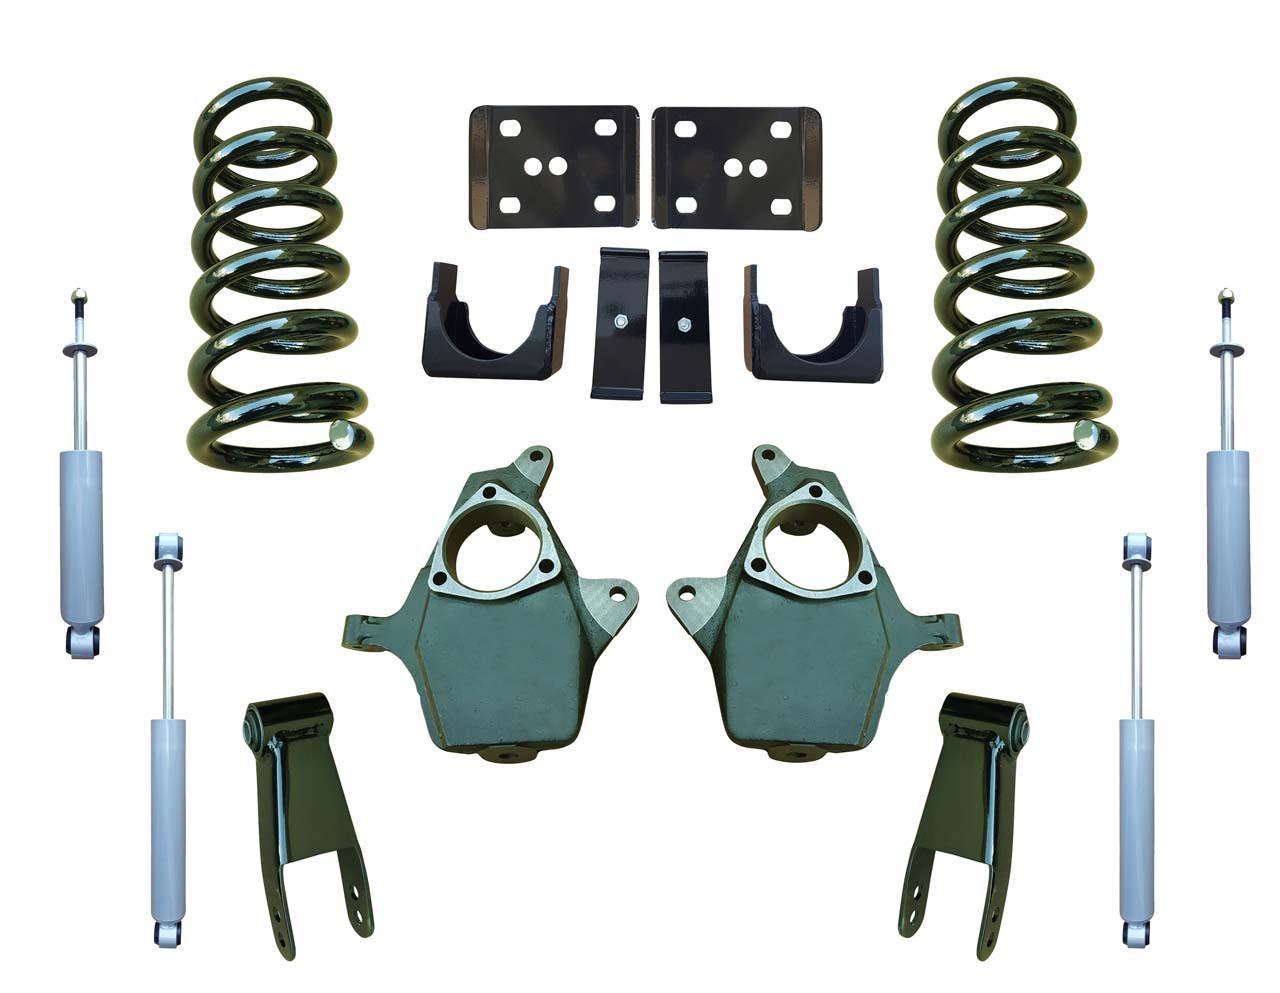 99-06 Chevrolet Silverado 5/7 Drop Kit Coil Springs and Drop Shocks